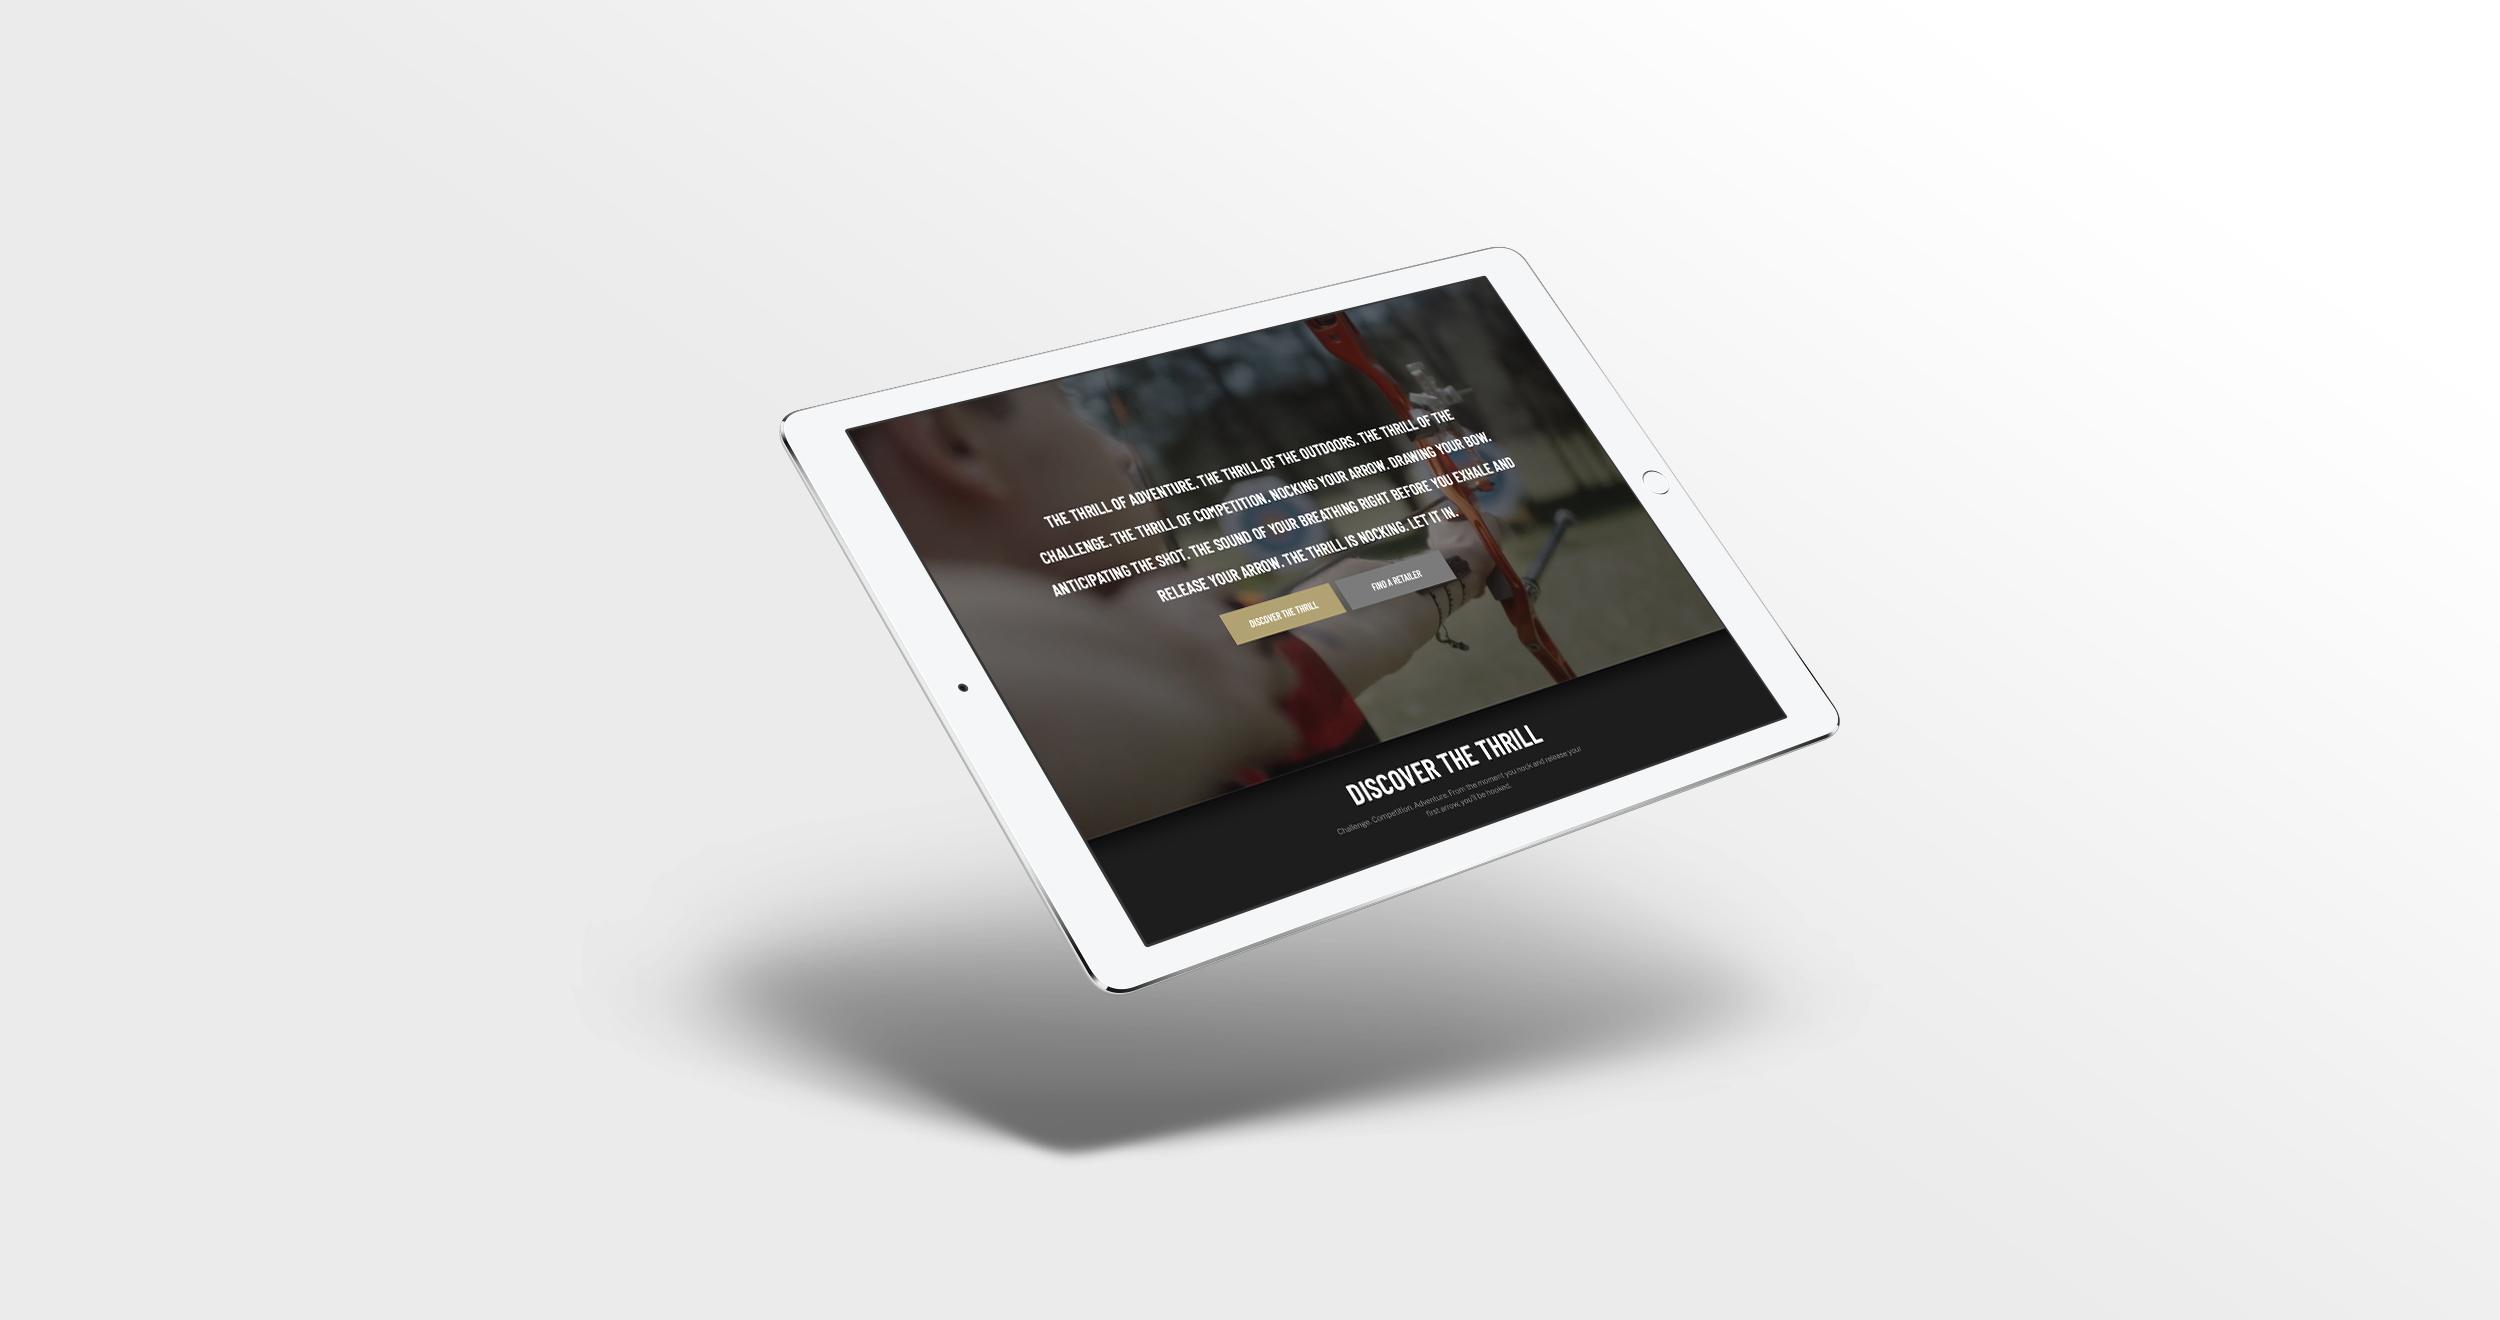 TTIN_LandingPage_iPad2.jpg